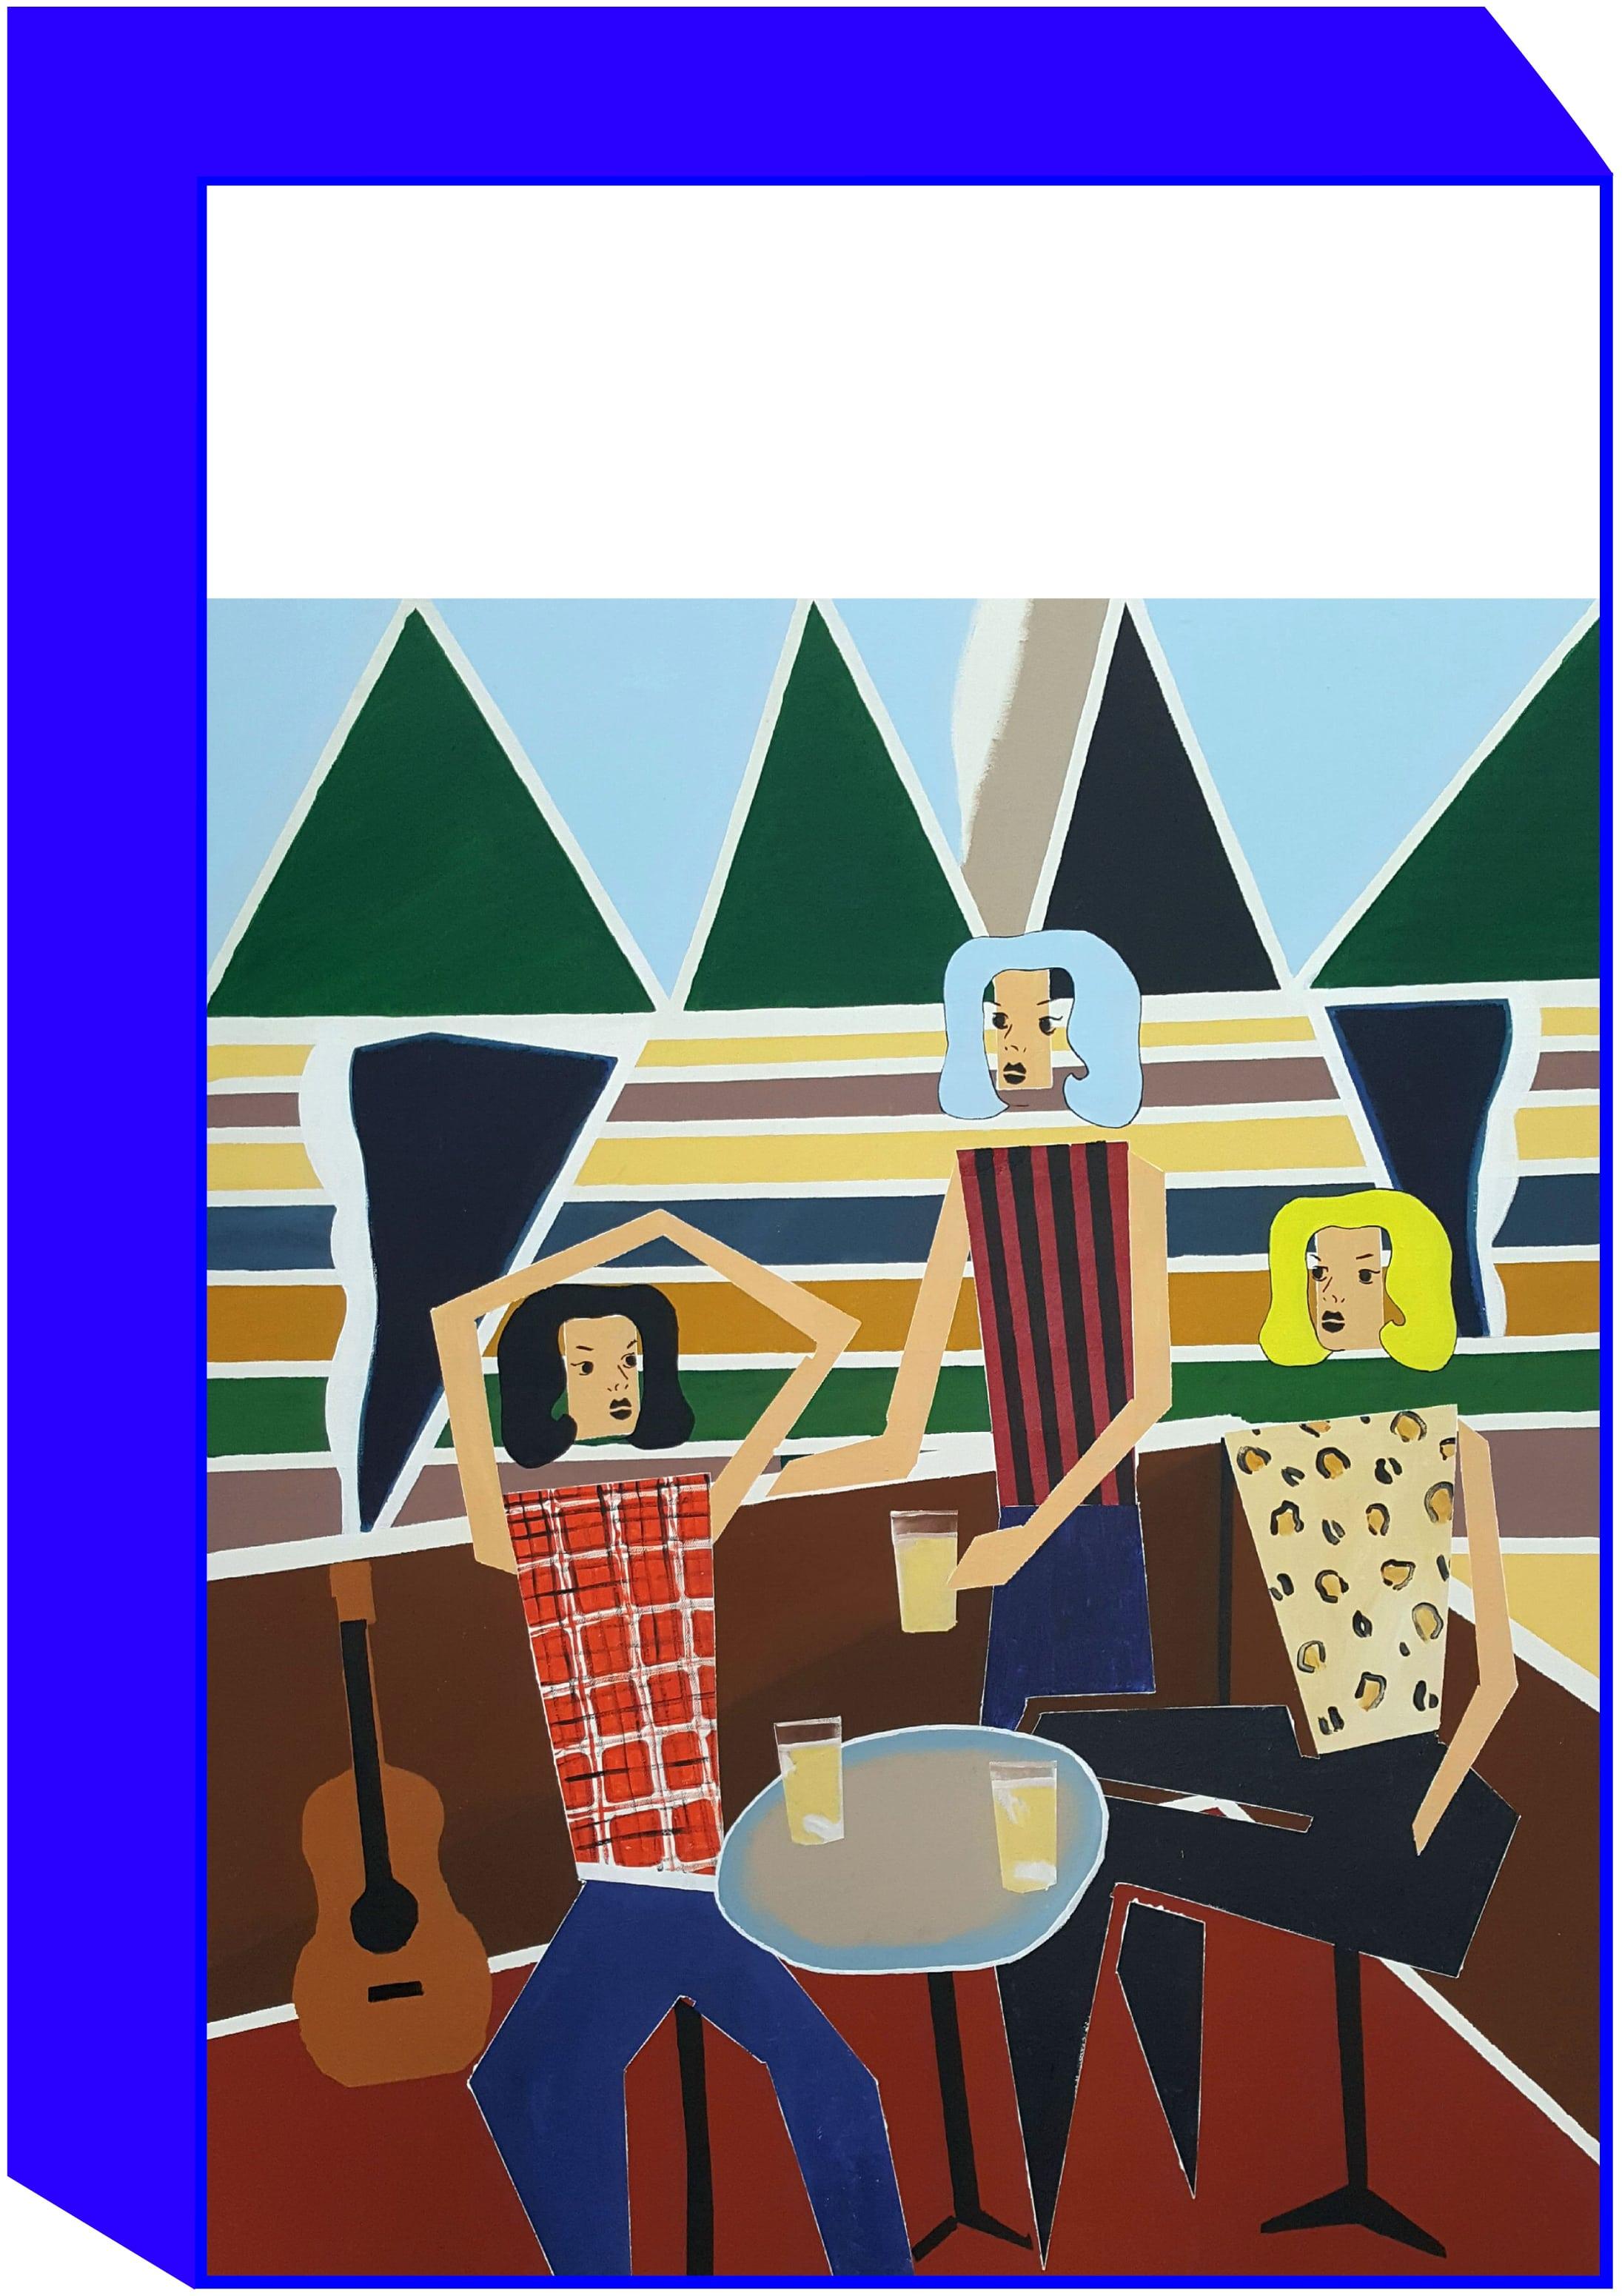 """Backstage"" by Michel Castaignet, 2018. 150x180cm, acrylic on canvas."